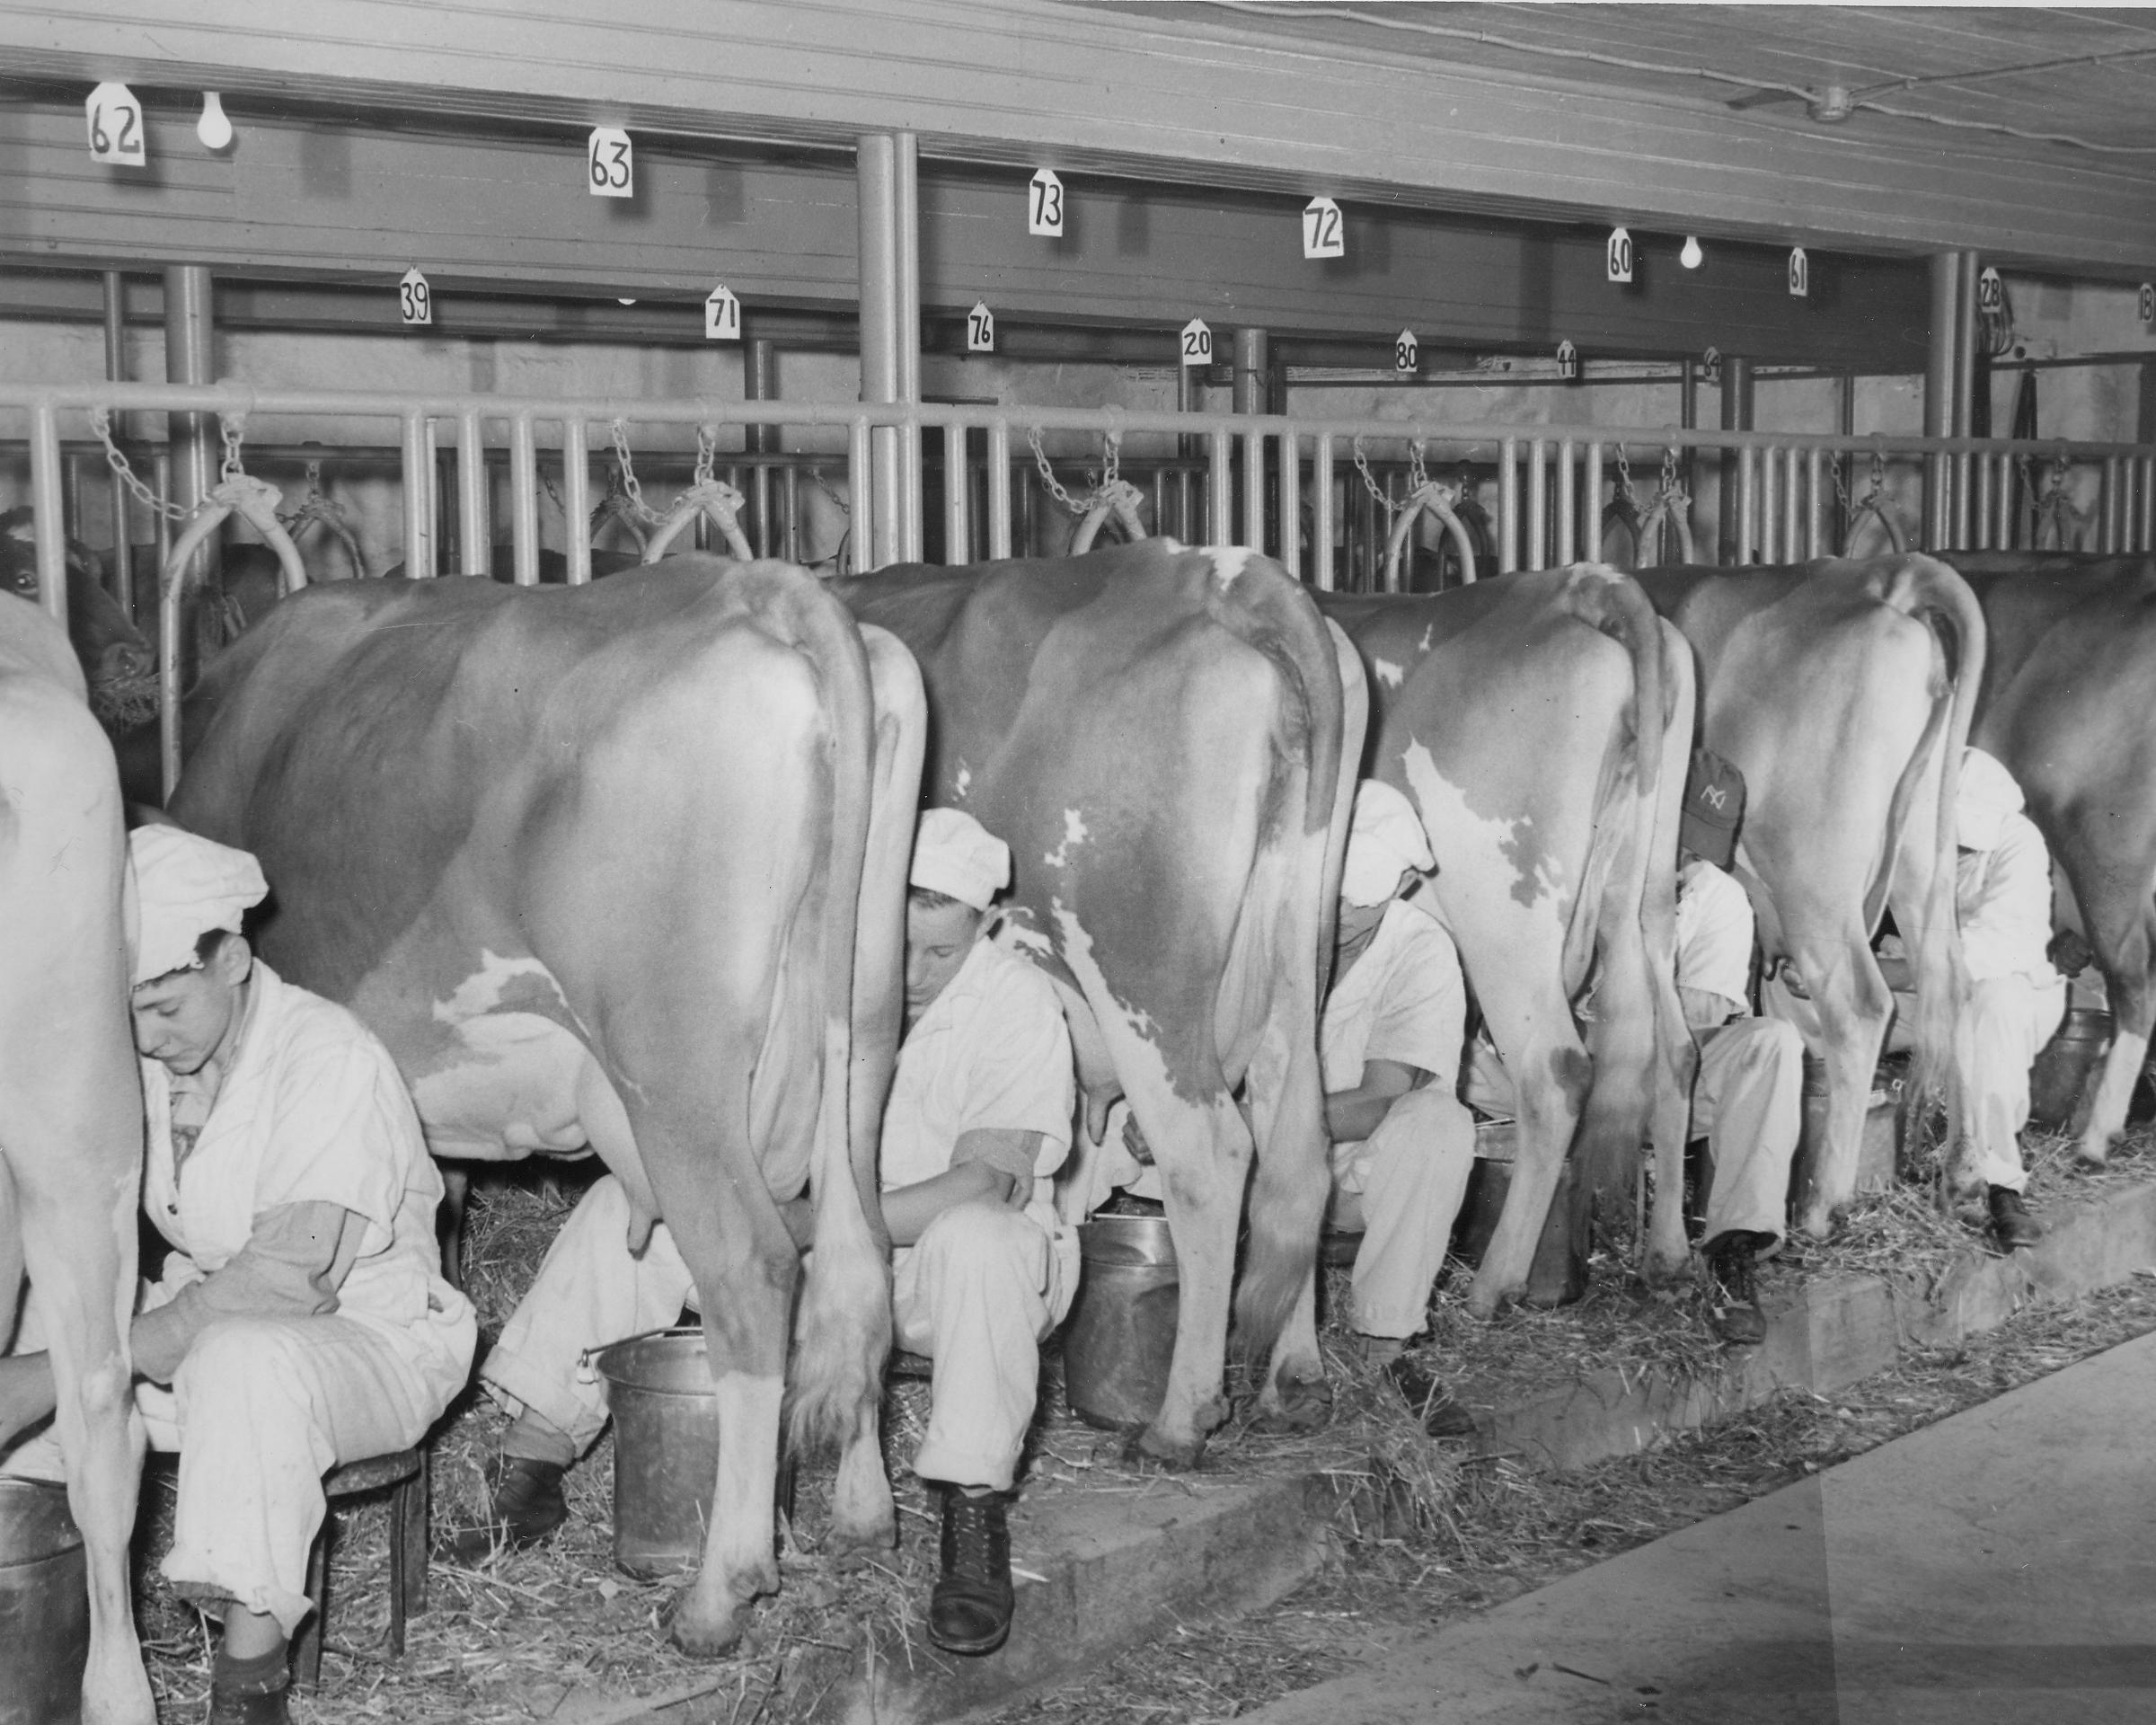 Barn_early_1950s.jpg